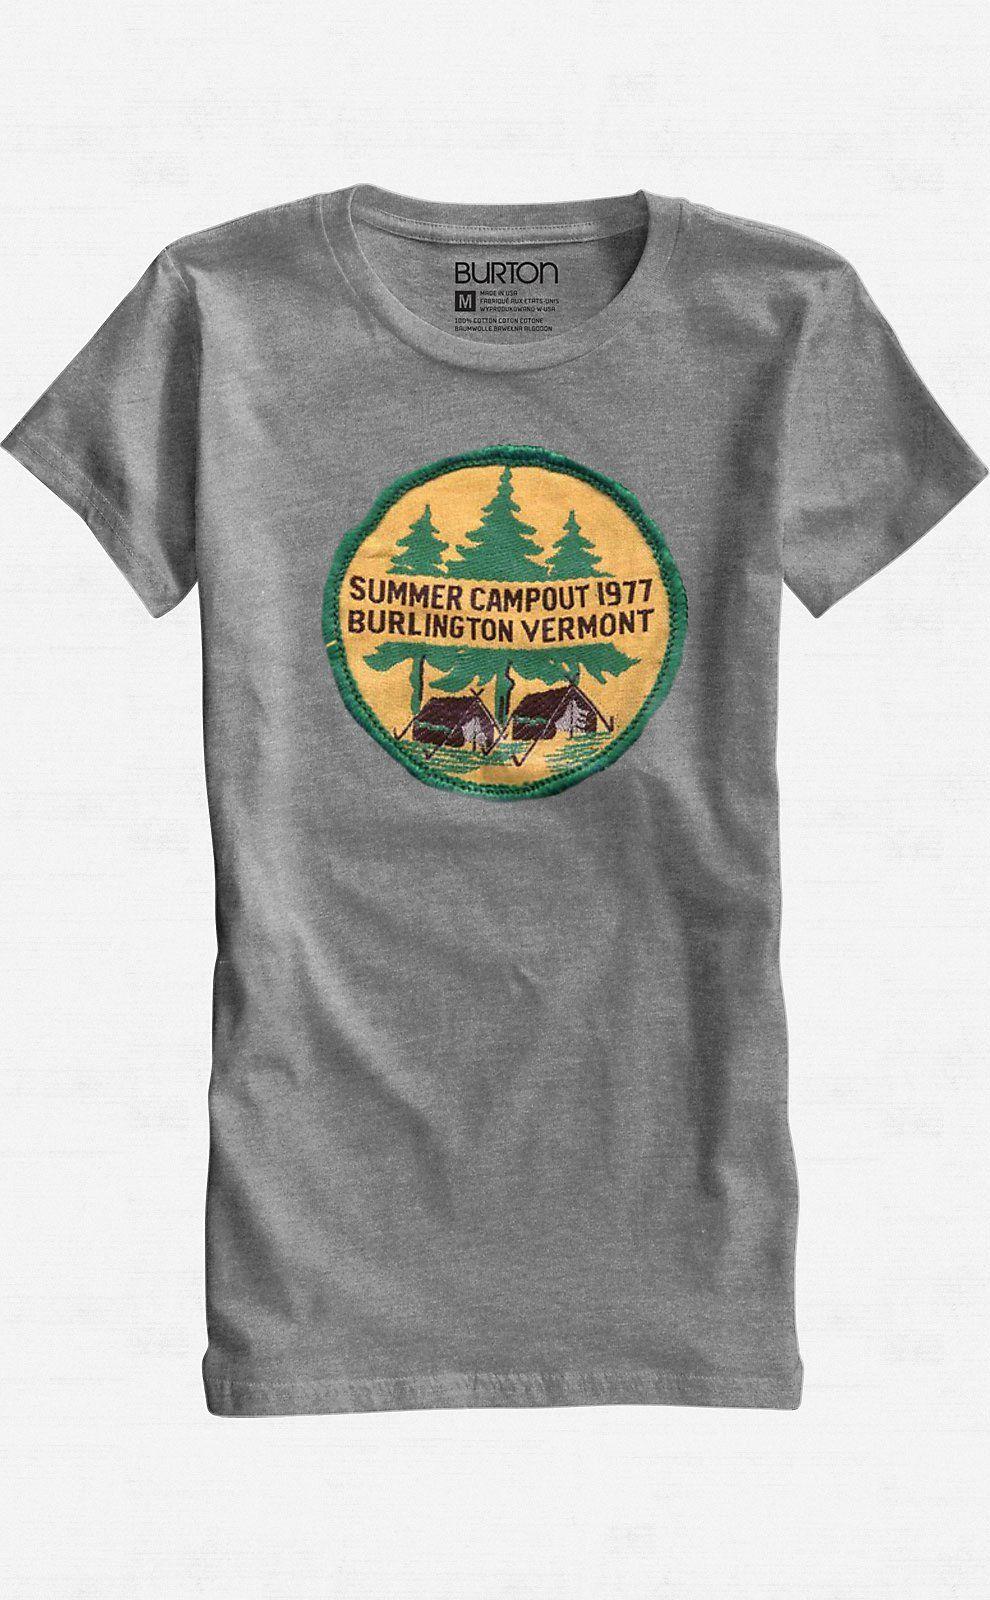 Burton Out T Shirt Snowboards Camp Short Womens Sleeve xqawYRF5